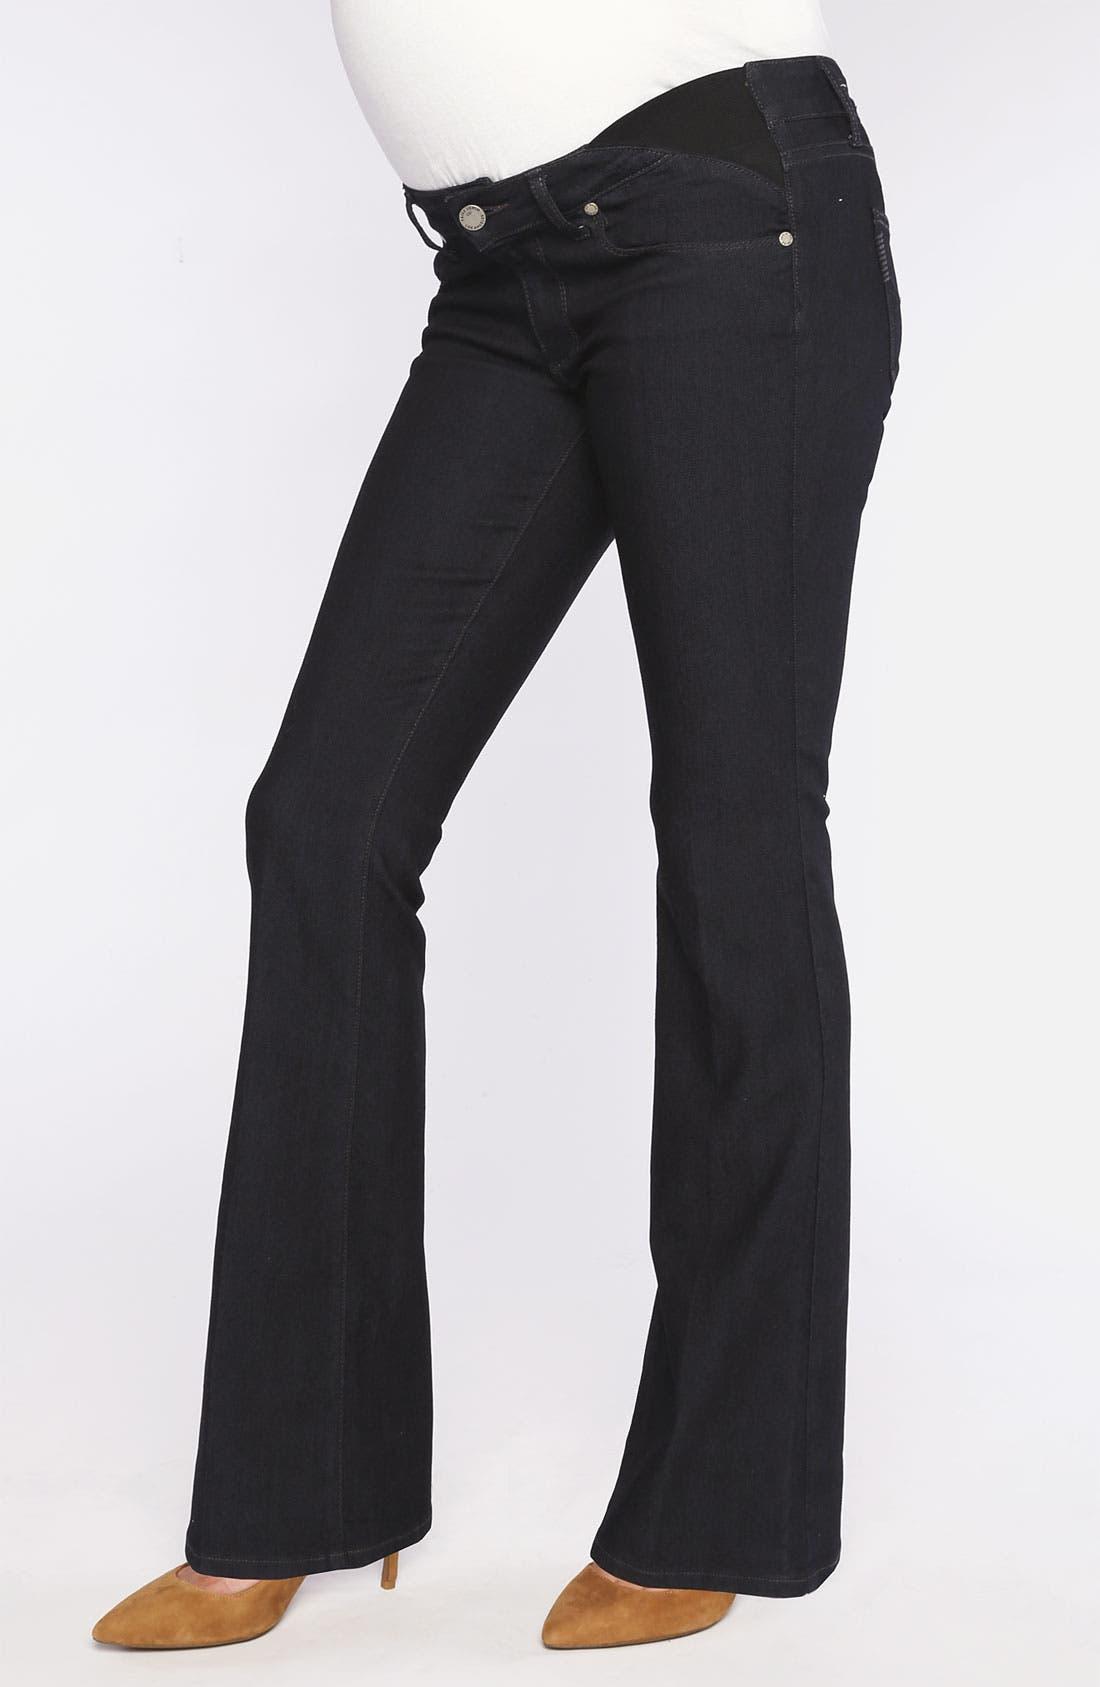 Main Image - Paige Denim 'Skyline' Maternity Bootcut Jeans (Petite) (Twilight)